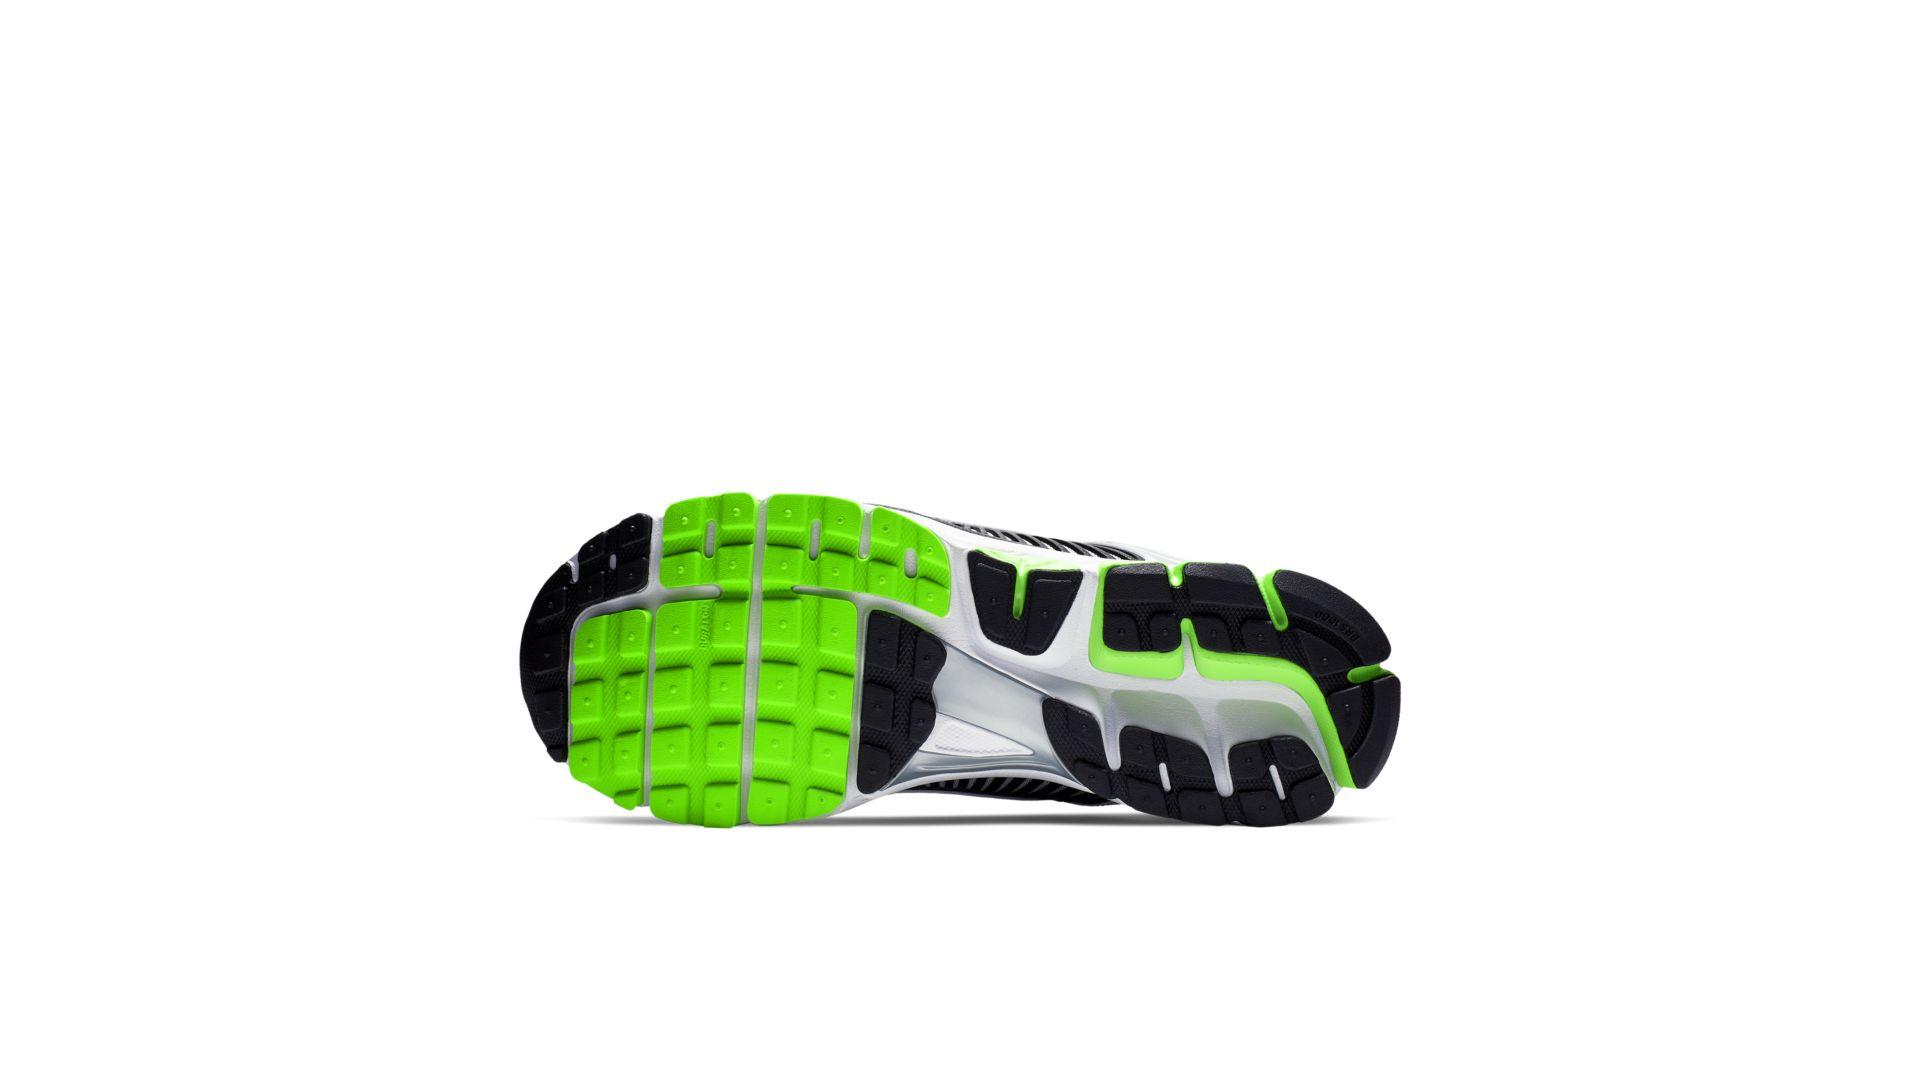 Nike Zoom Vemero 5 SE SP 'Electic Green' (CI1694-300)